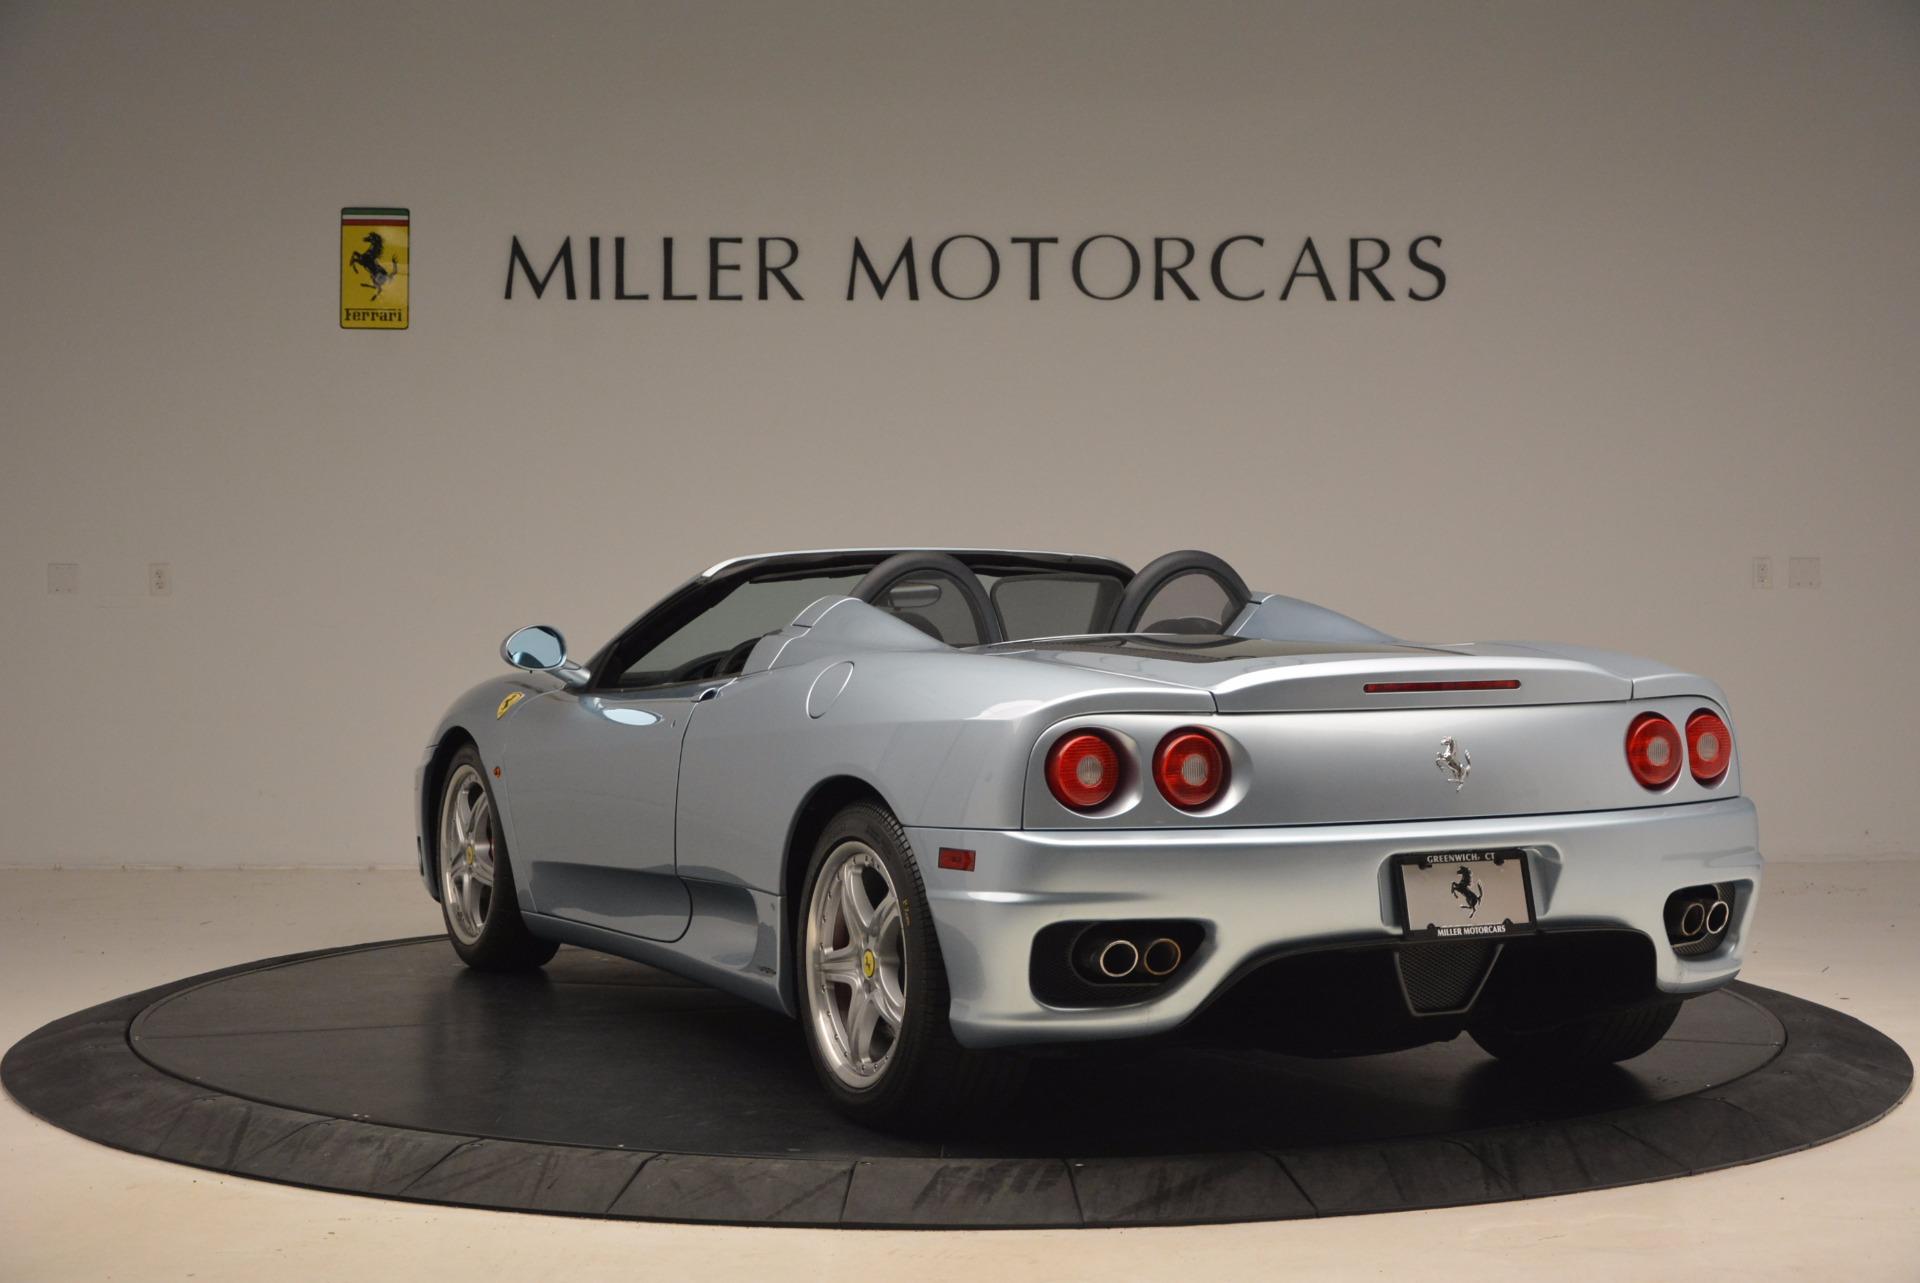 Used 2003 Ferrari 360 Spider 6-Speed Manual For Sale In Westport, CT 1445_p5